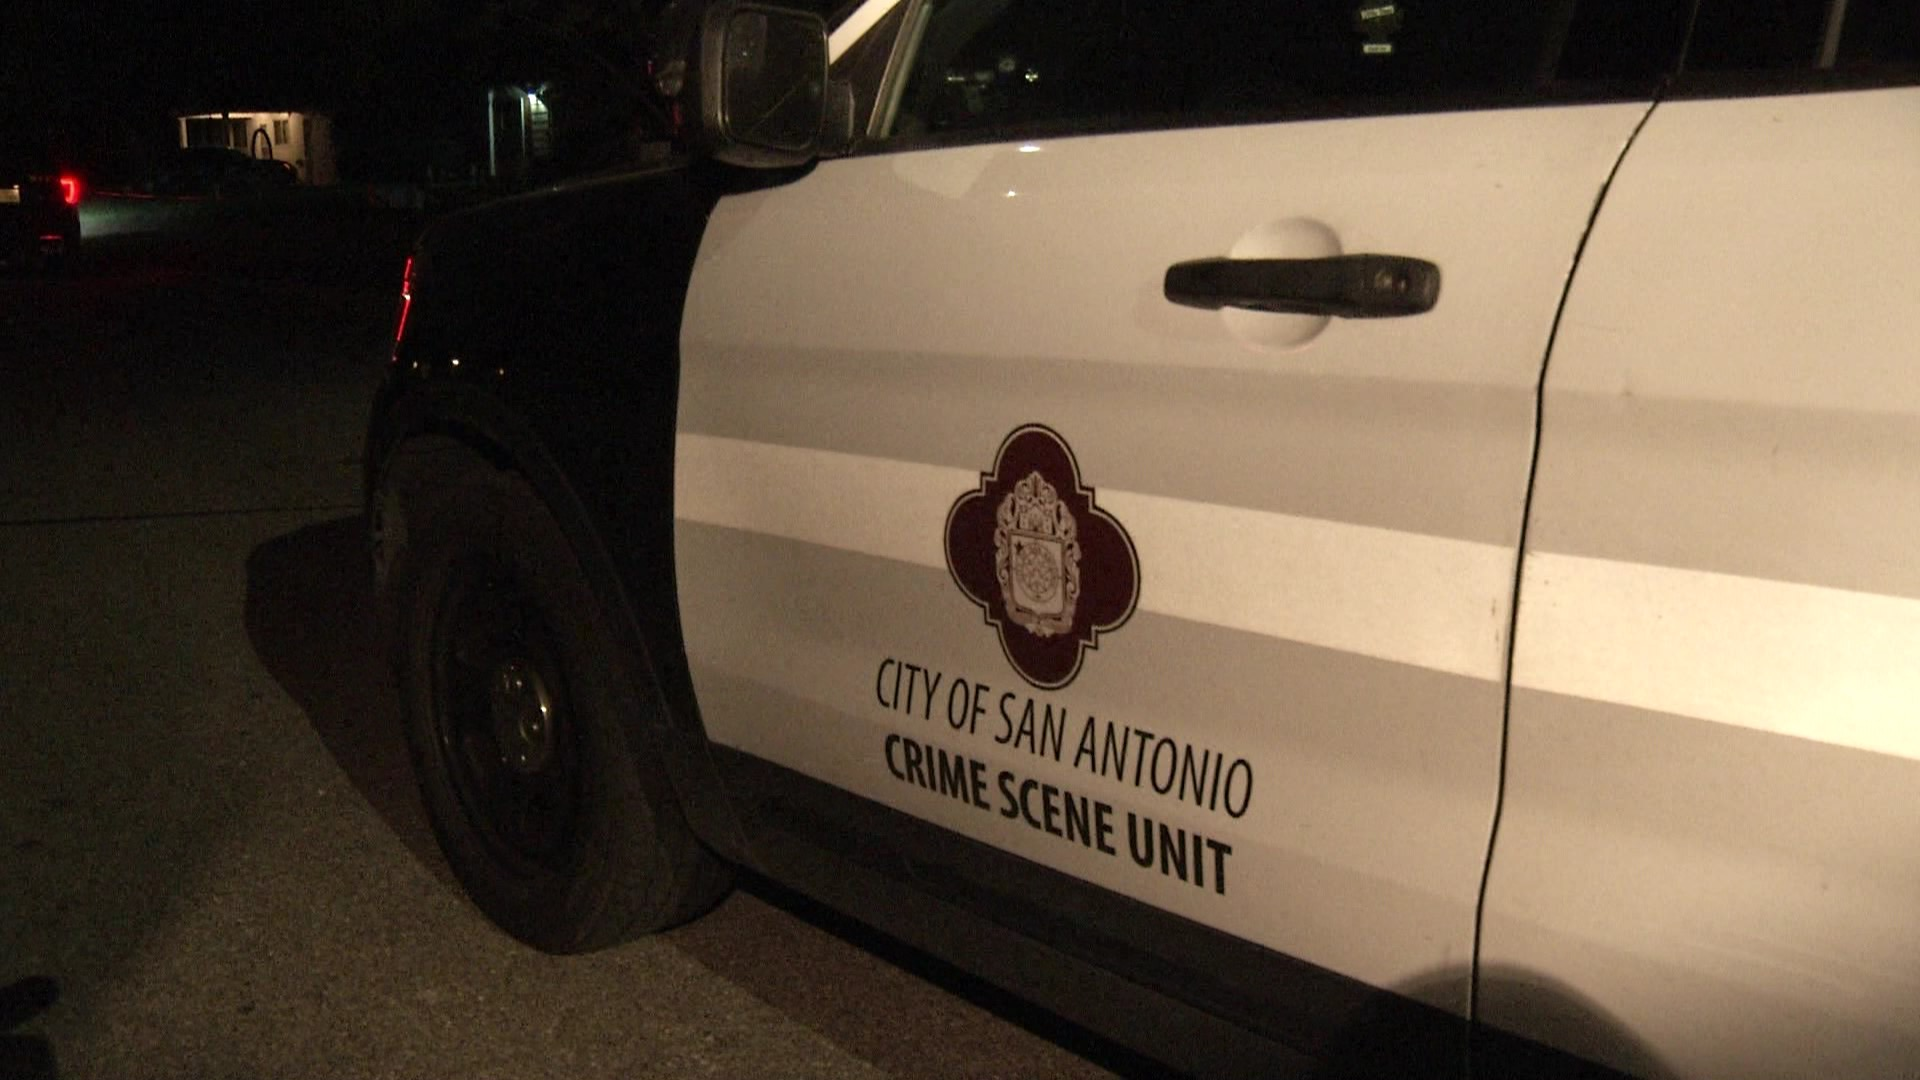 Drunken driving blamed in high-speed crash that killed San Antonio